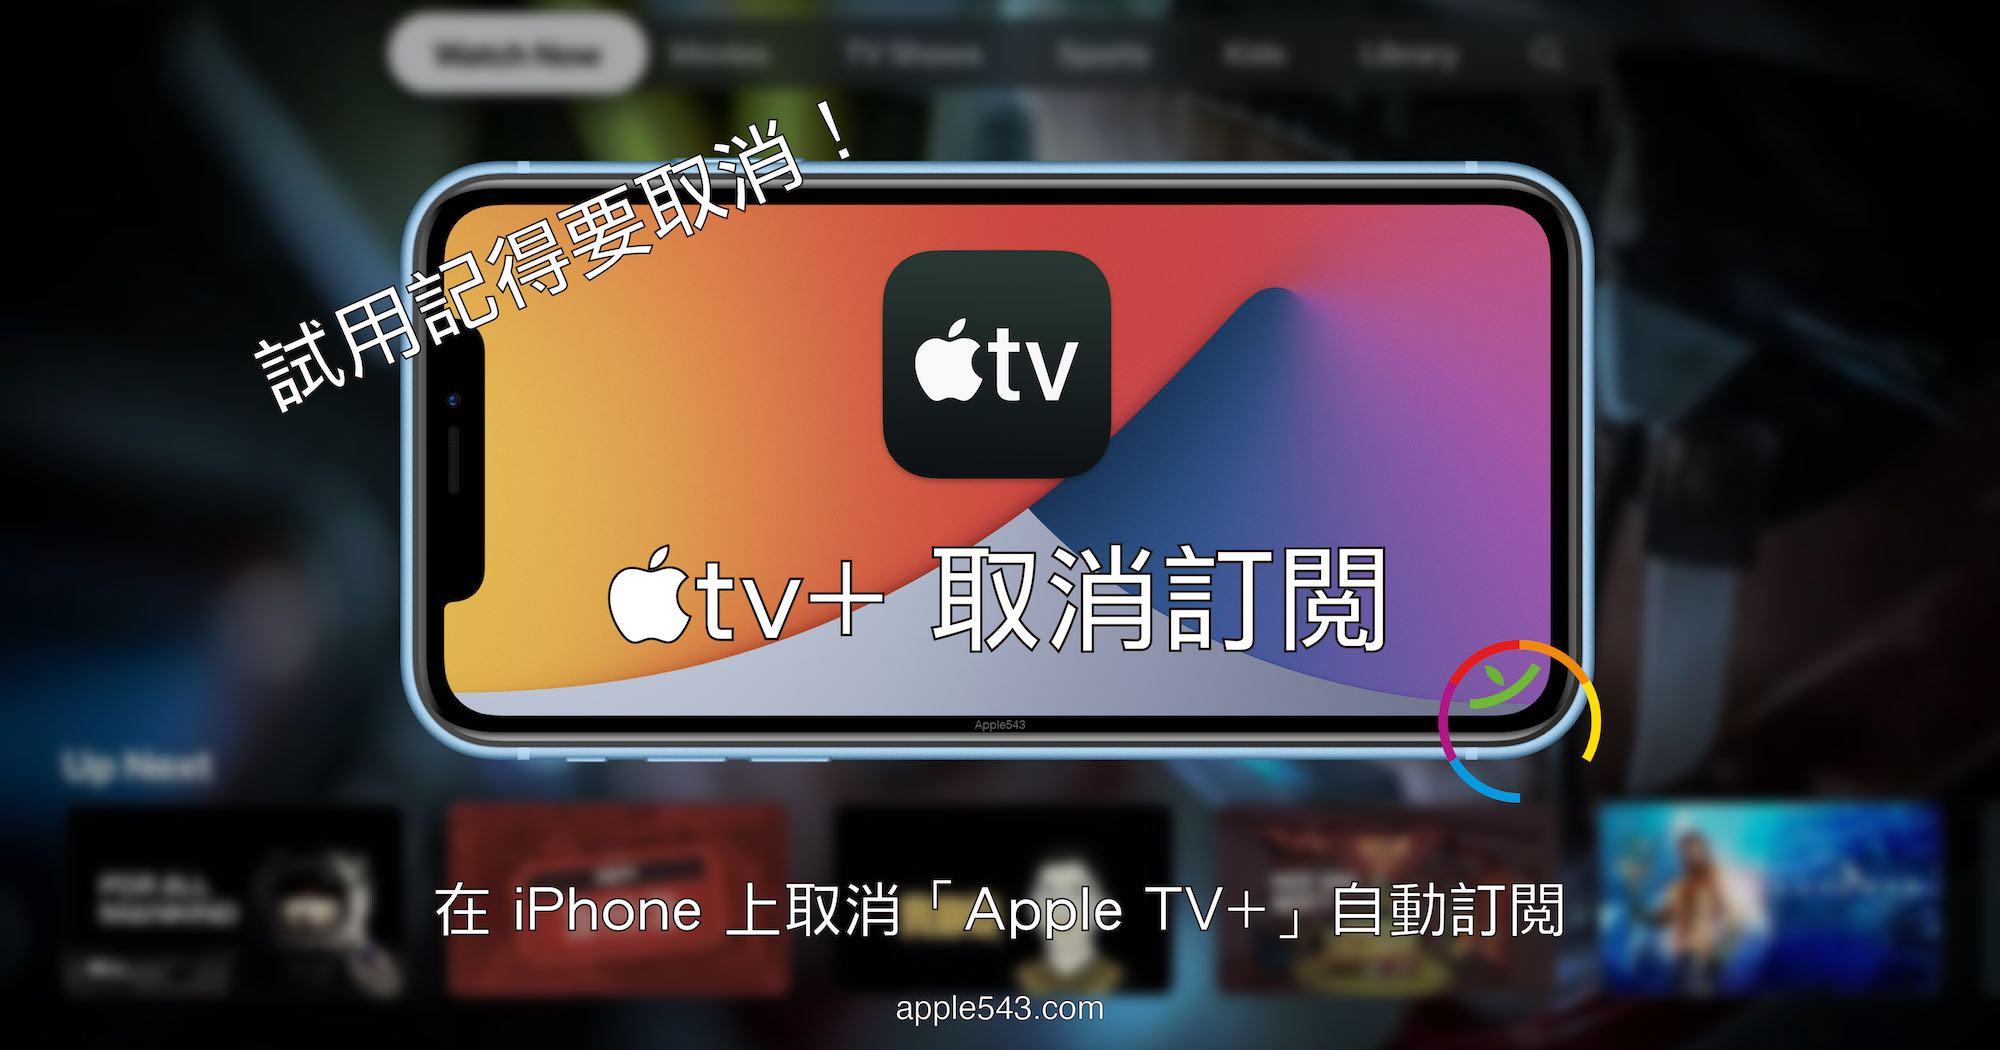 Apple TV+ 取消